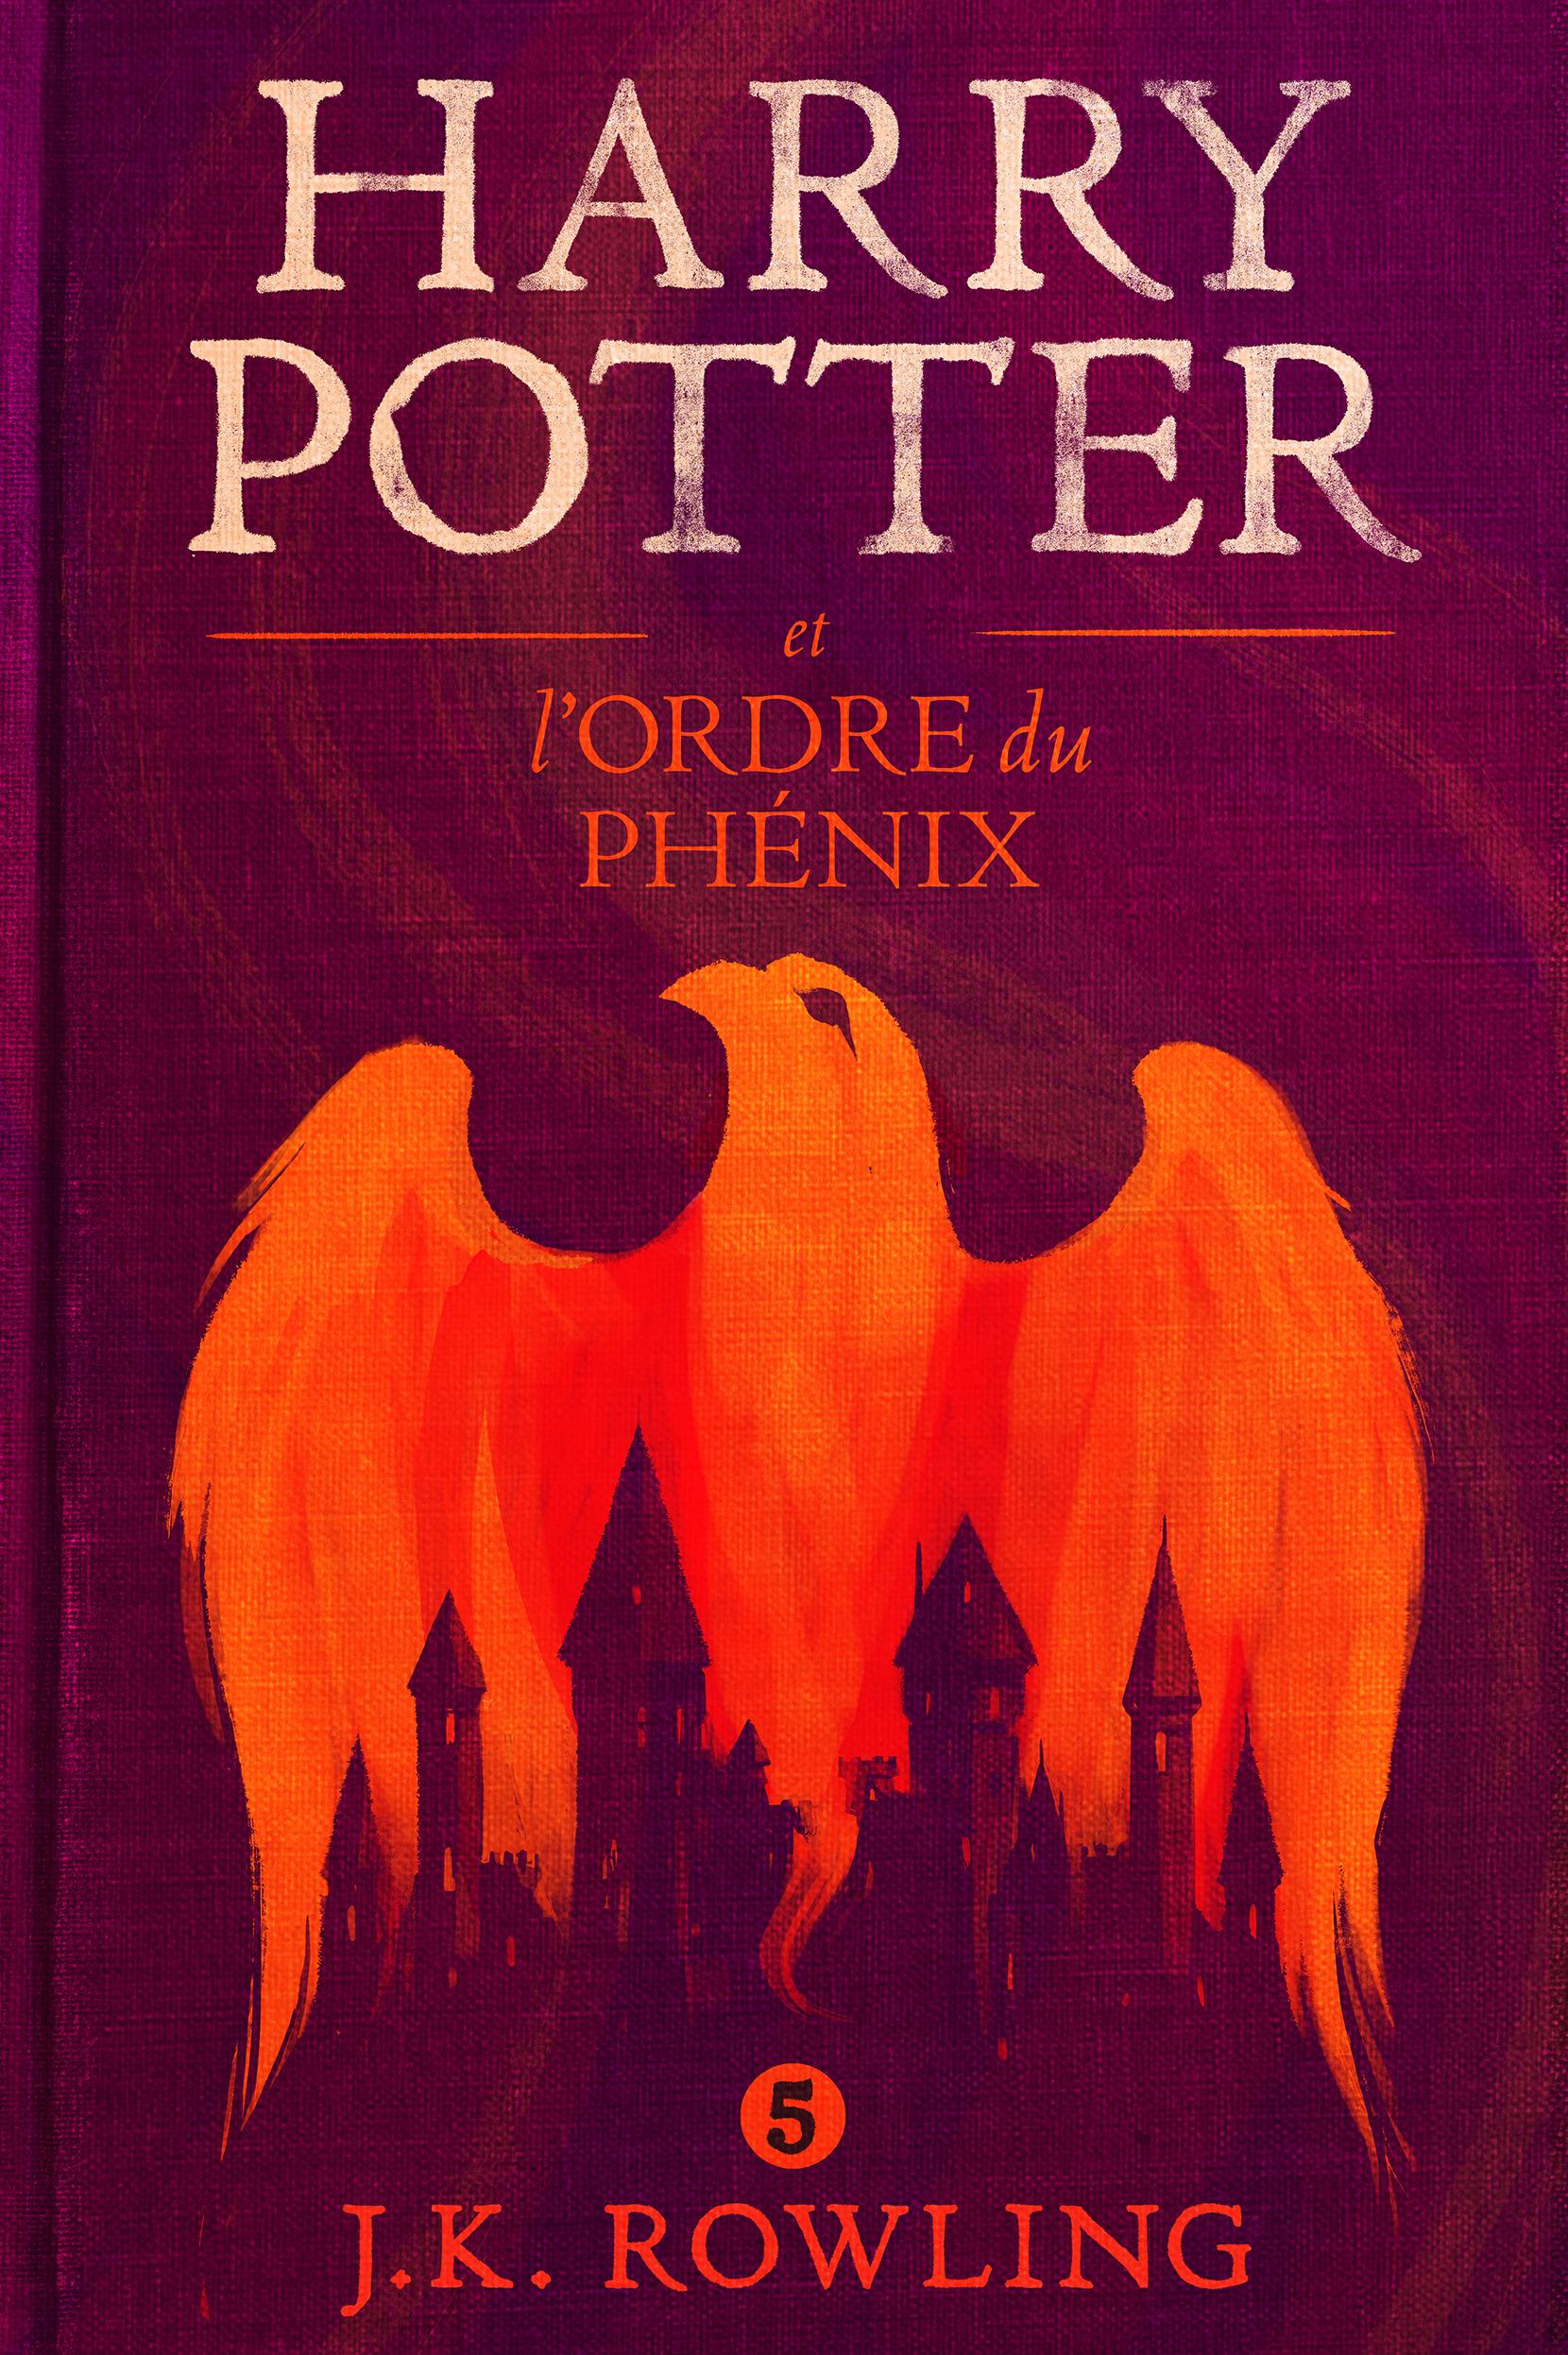 Harry Potter et l'Ordre du Phénix | Rowling, J.K.